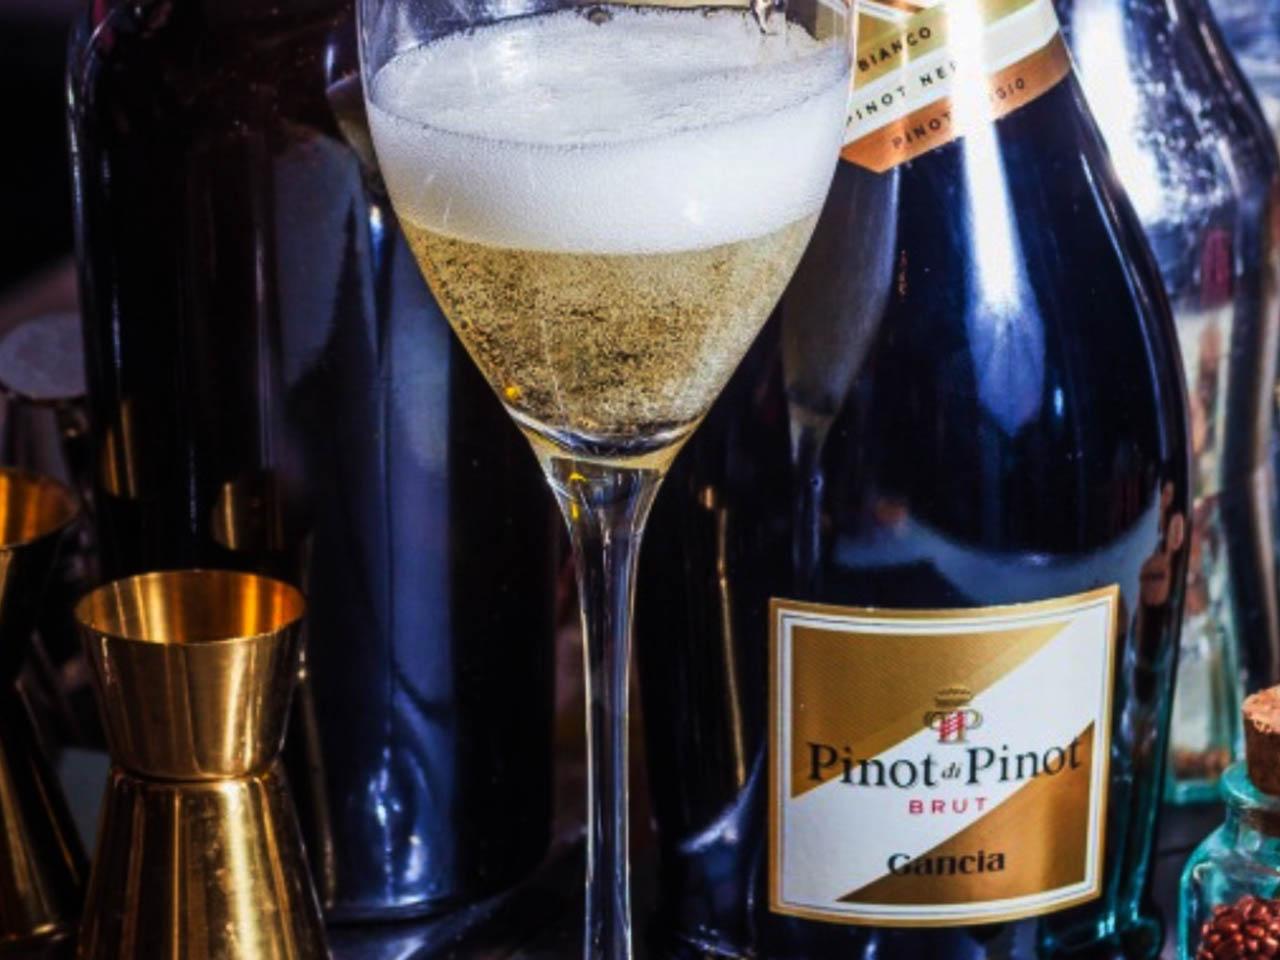 Pinot di Pinot